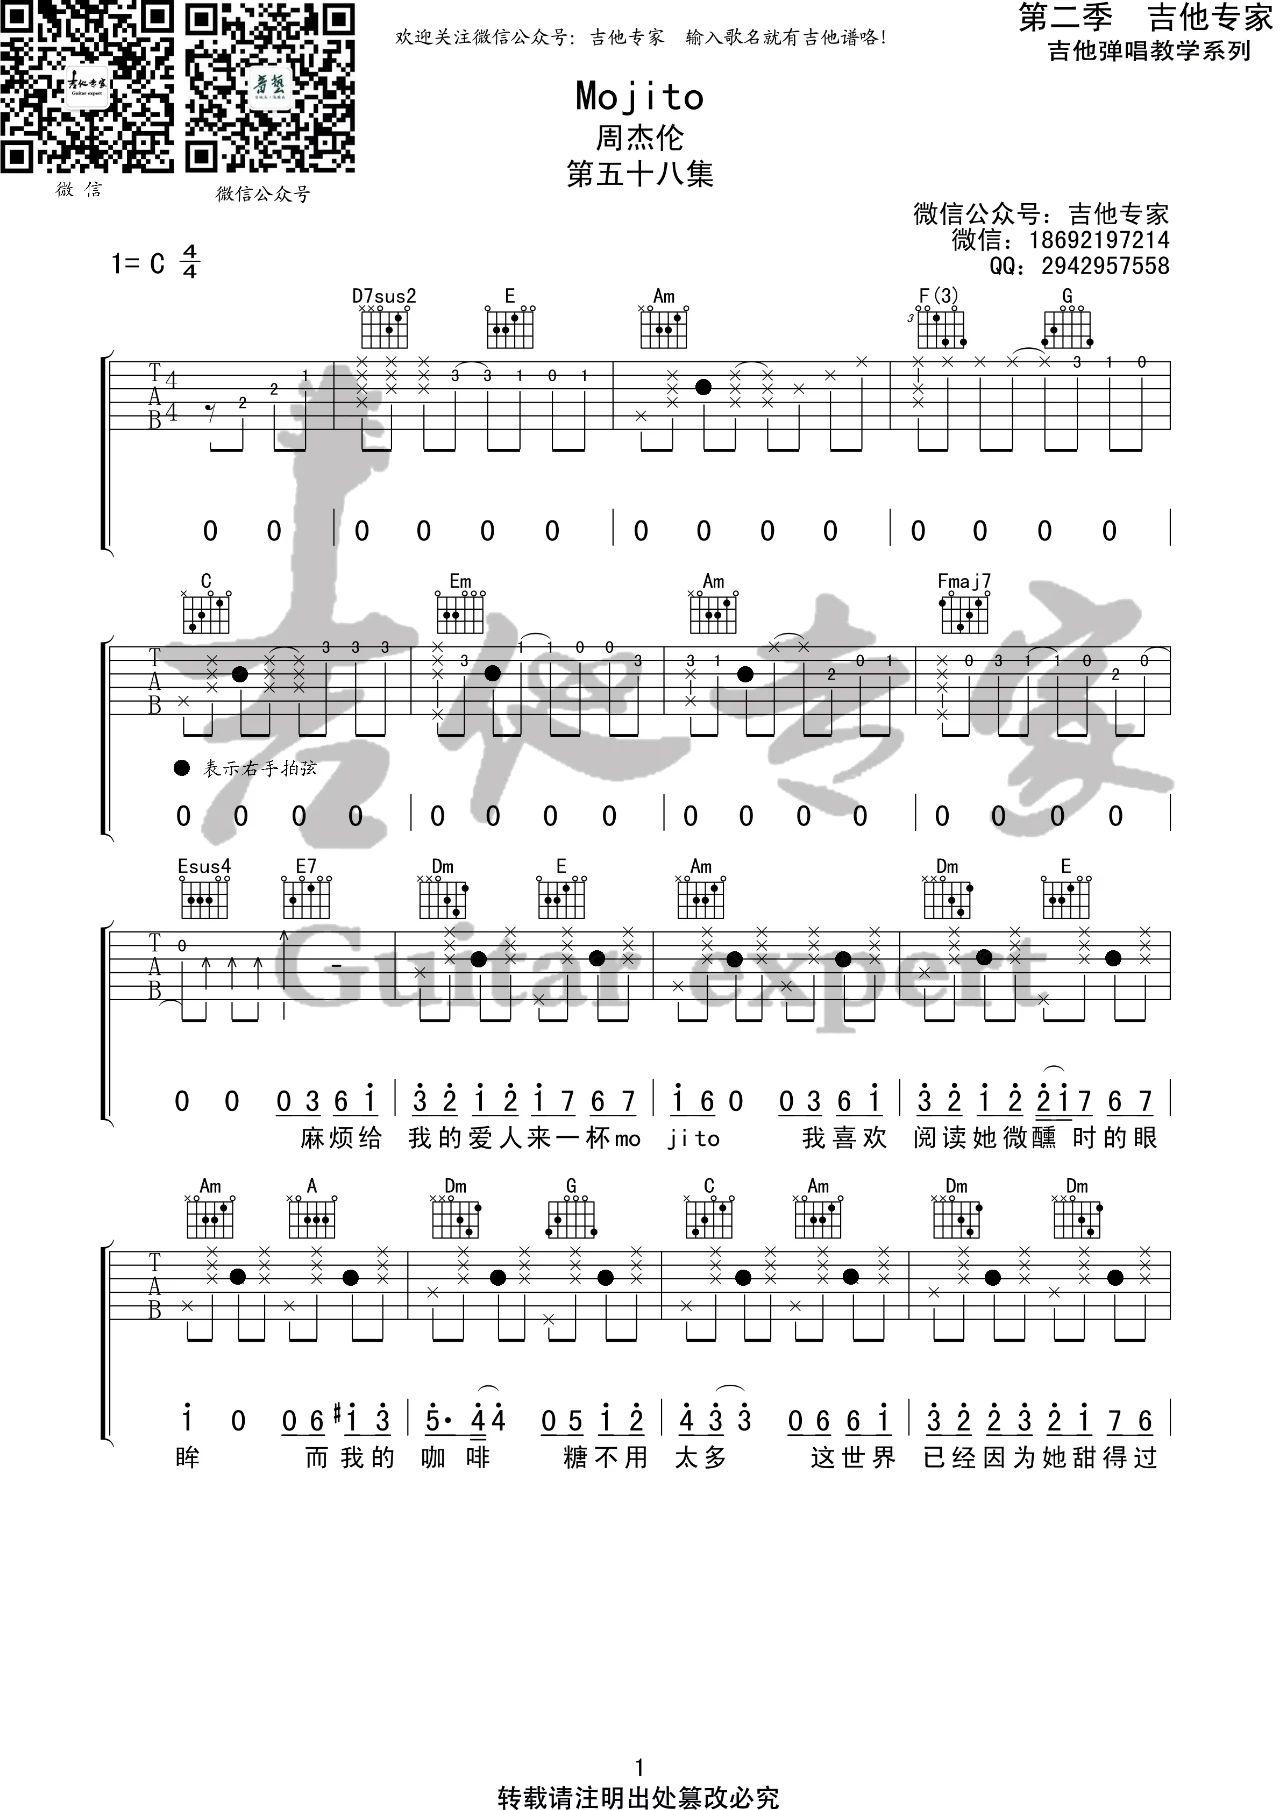 Mojito吉他谱C调完整版-1